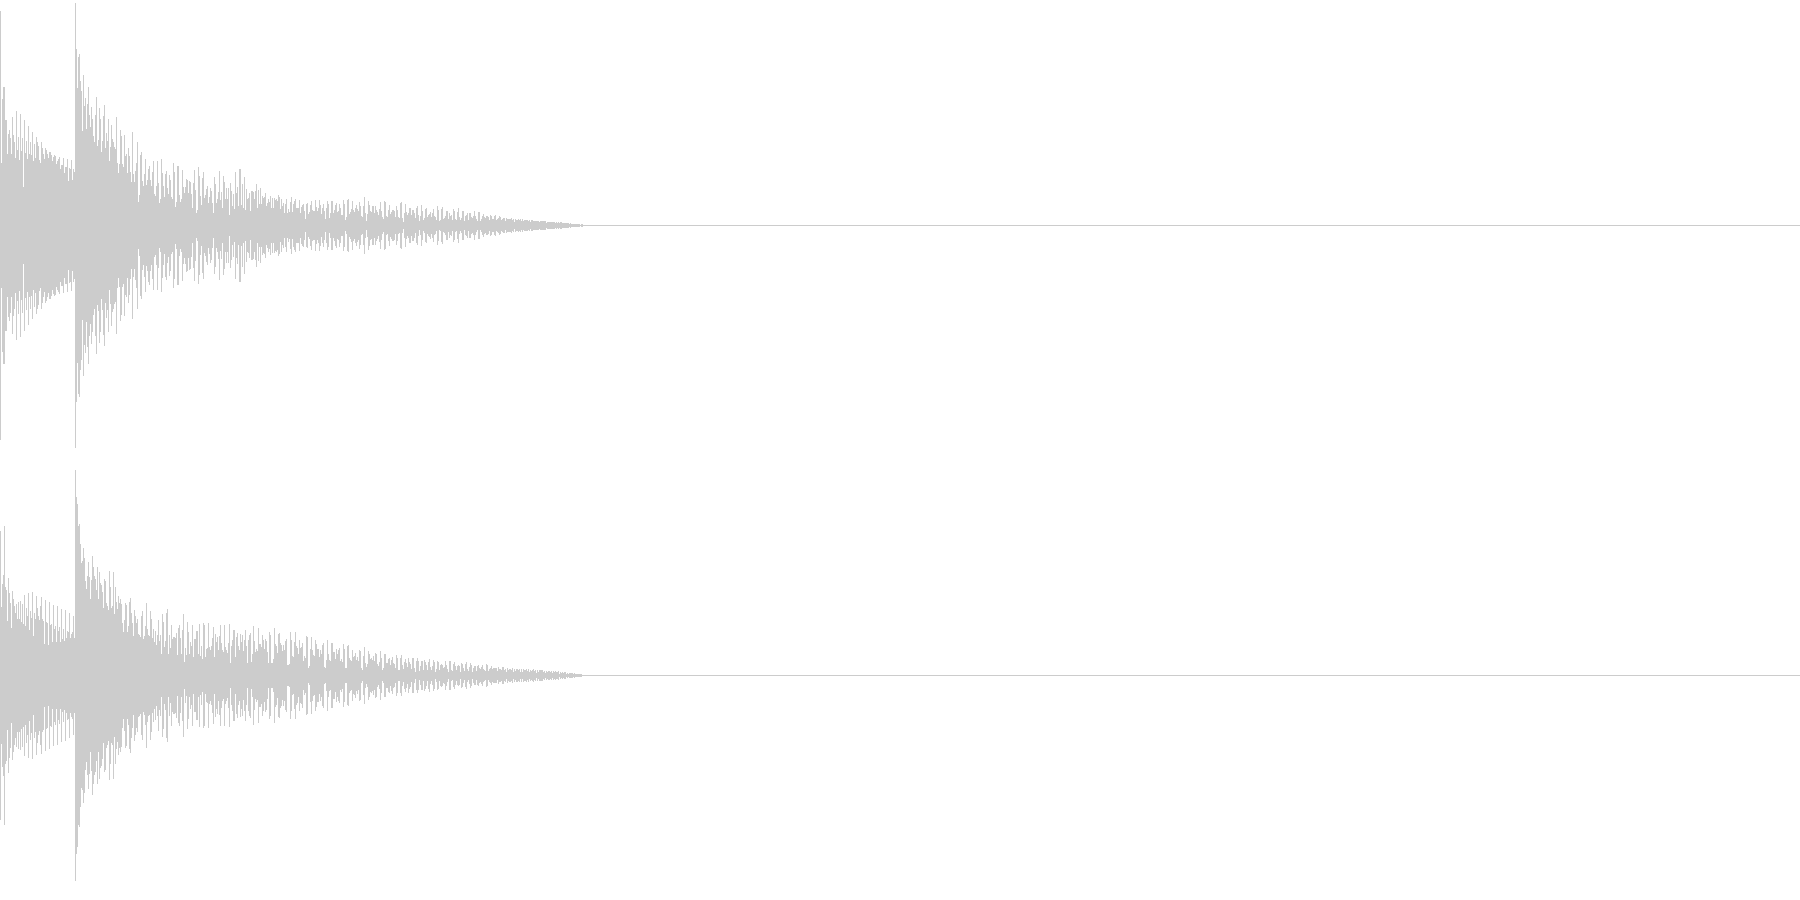 Cursor セレクト・カーソルの音9の未再生の波形